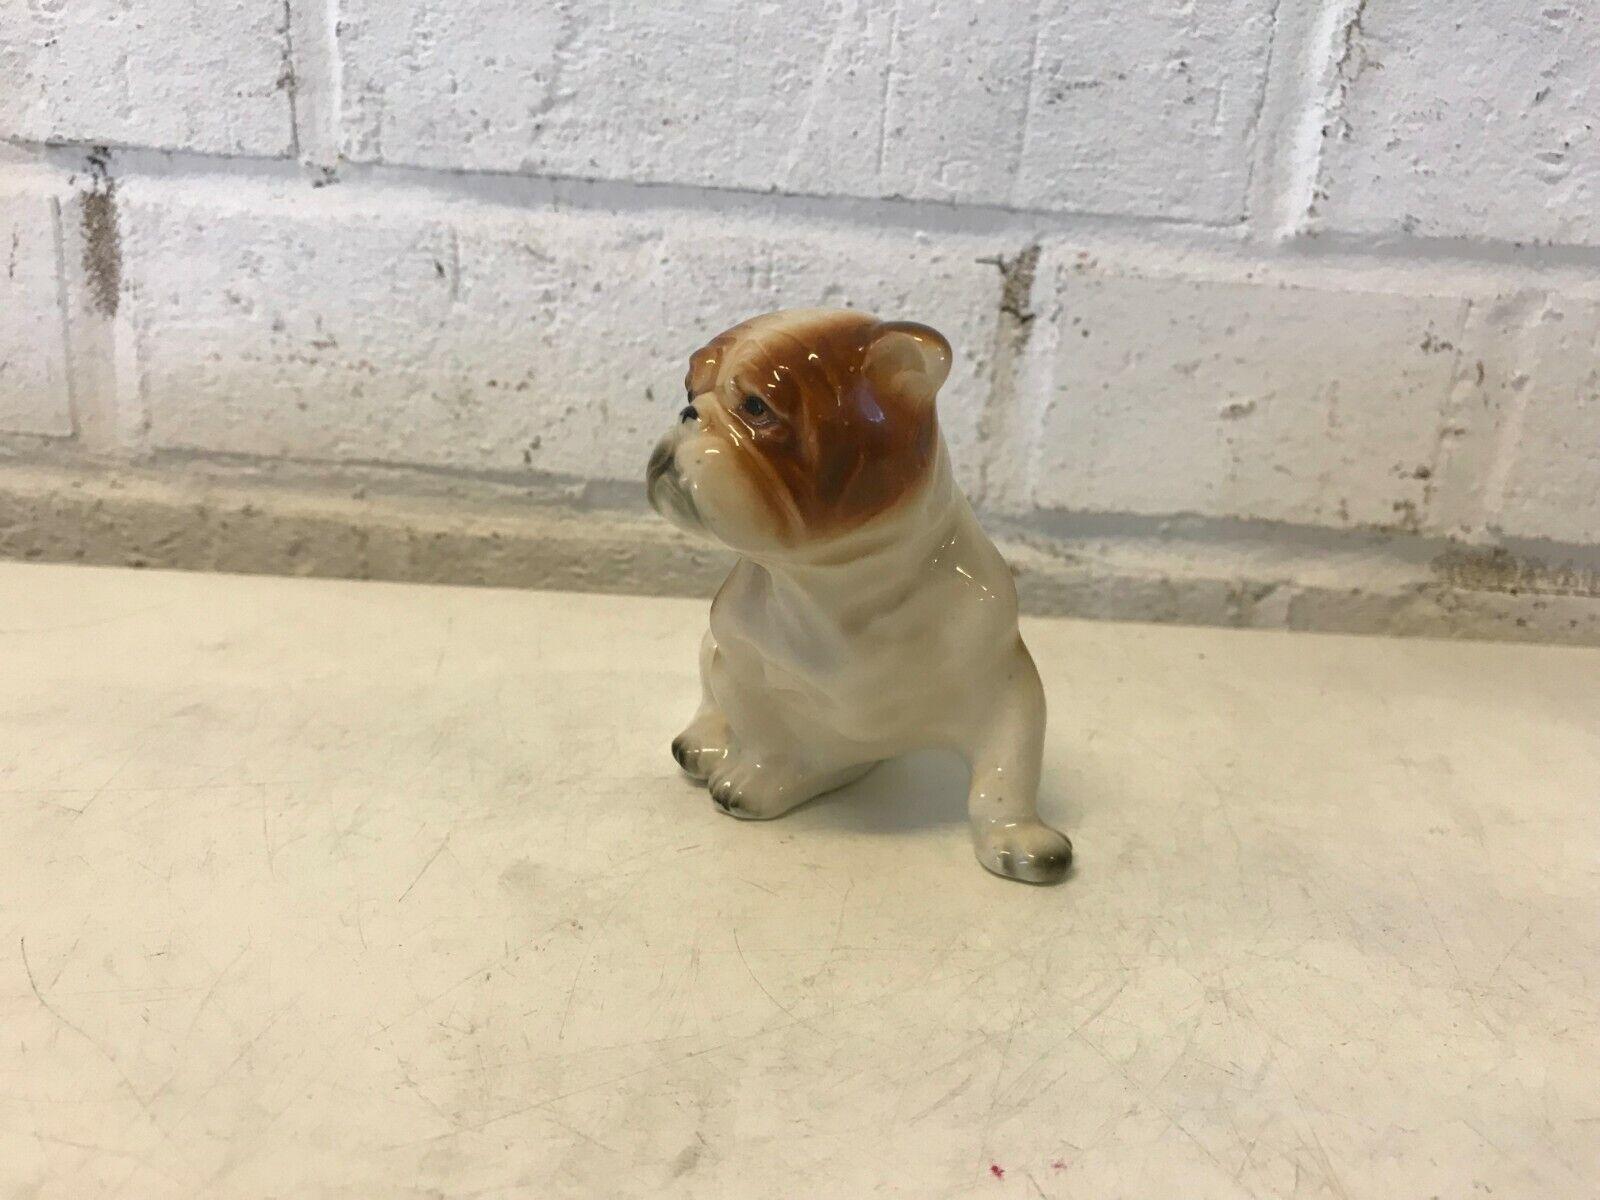 Bulldog anglais figurine assis marron & blanc porcelaine